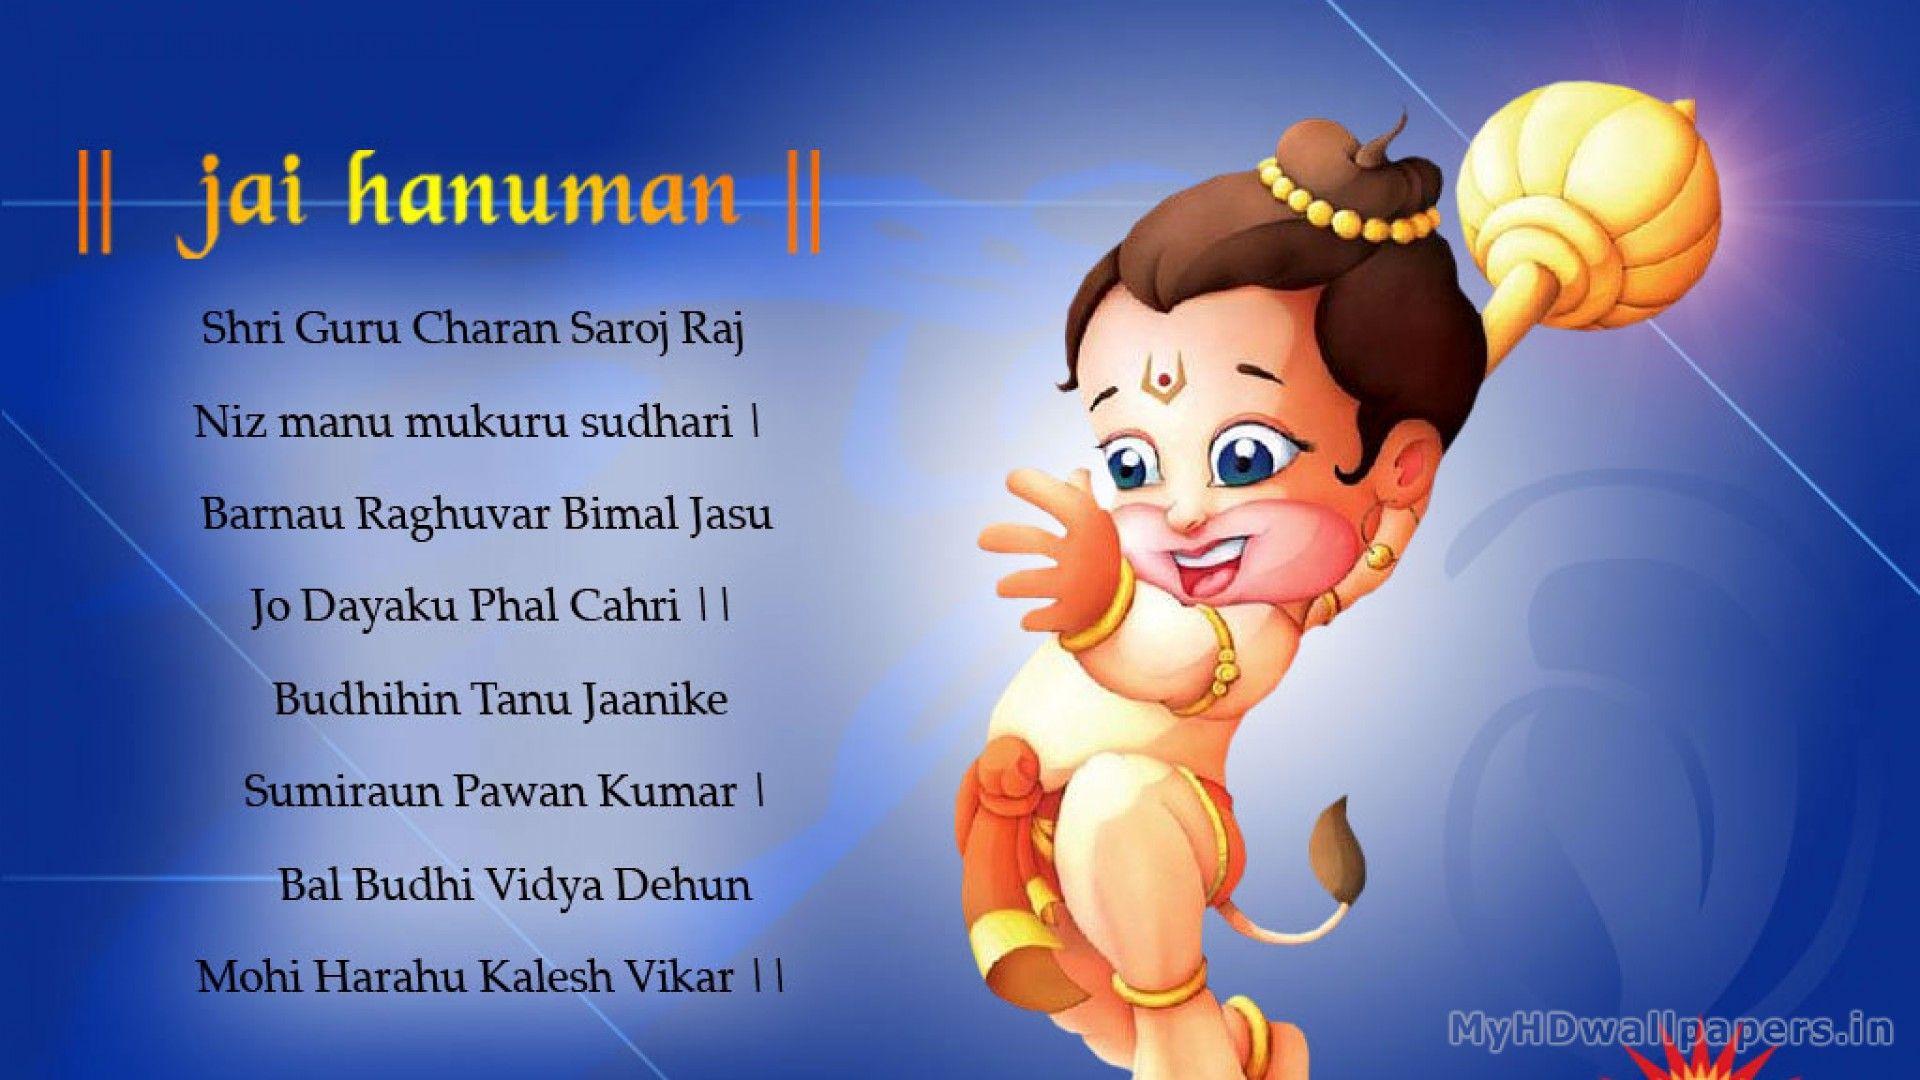 Pin By Hd Wallpapers On Hd Wallpapers Pinterest Hanuman